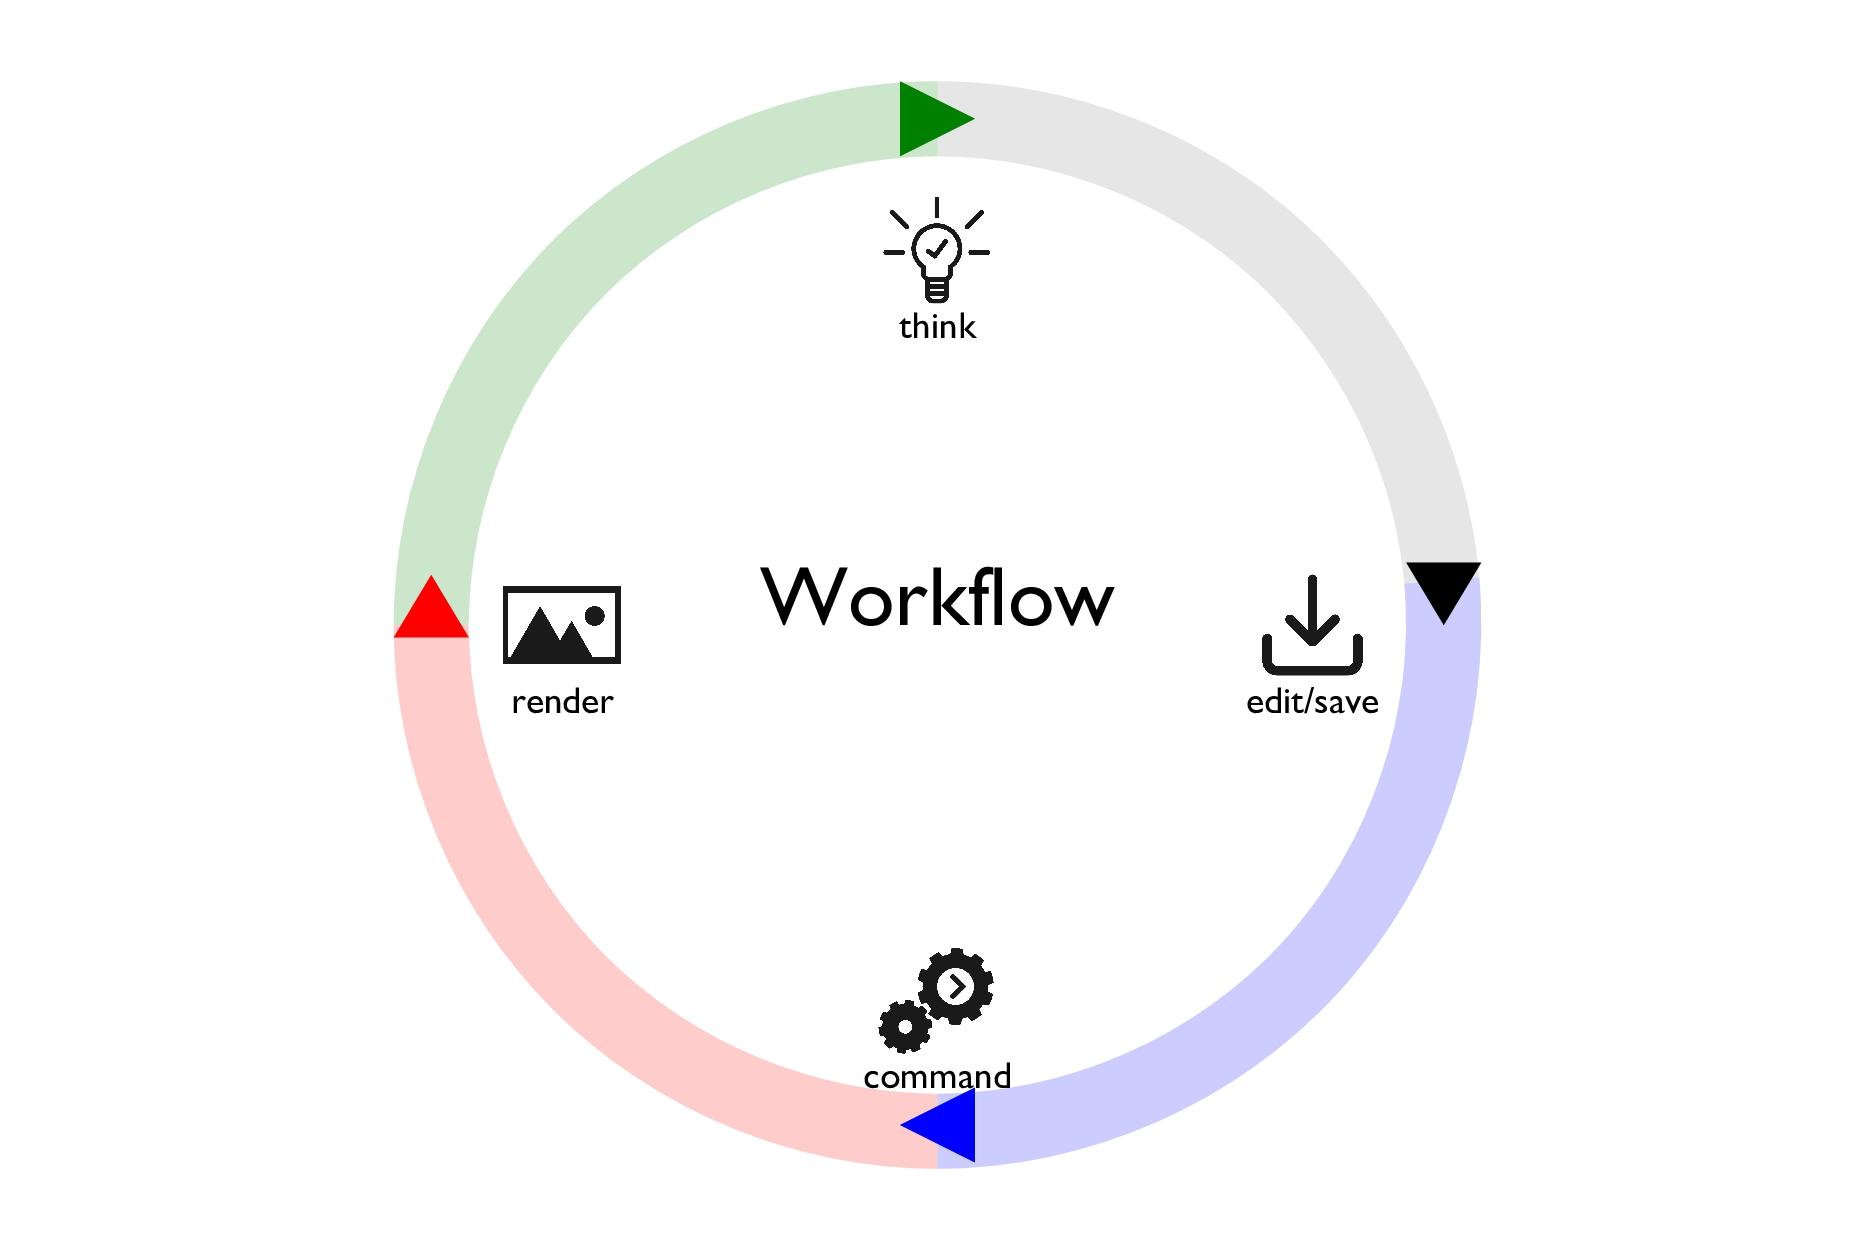 Workflow think command render edit/save